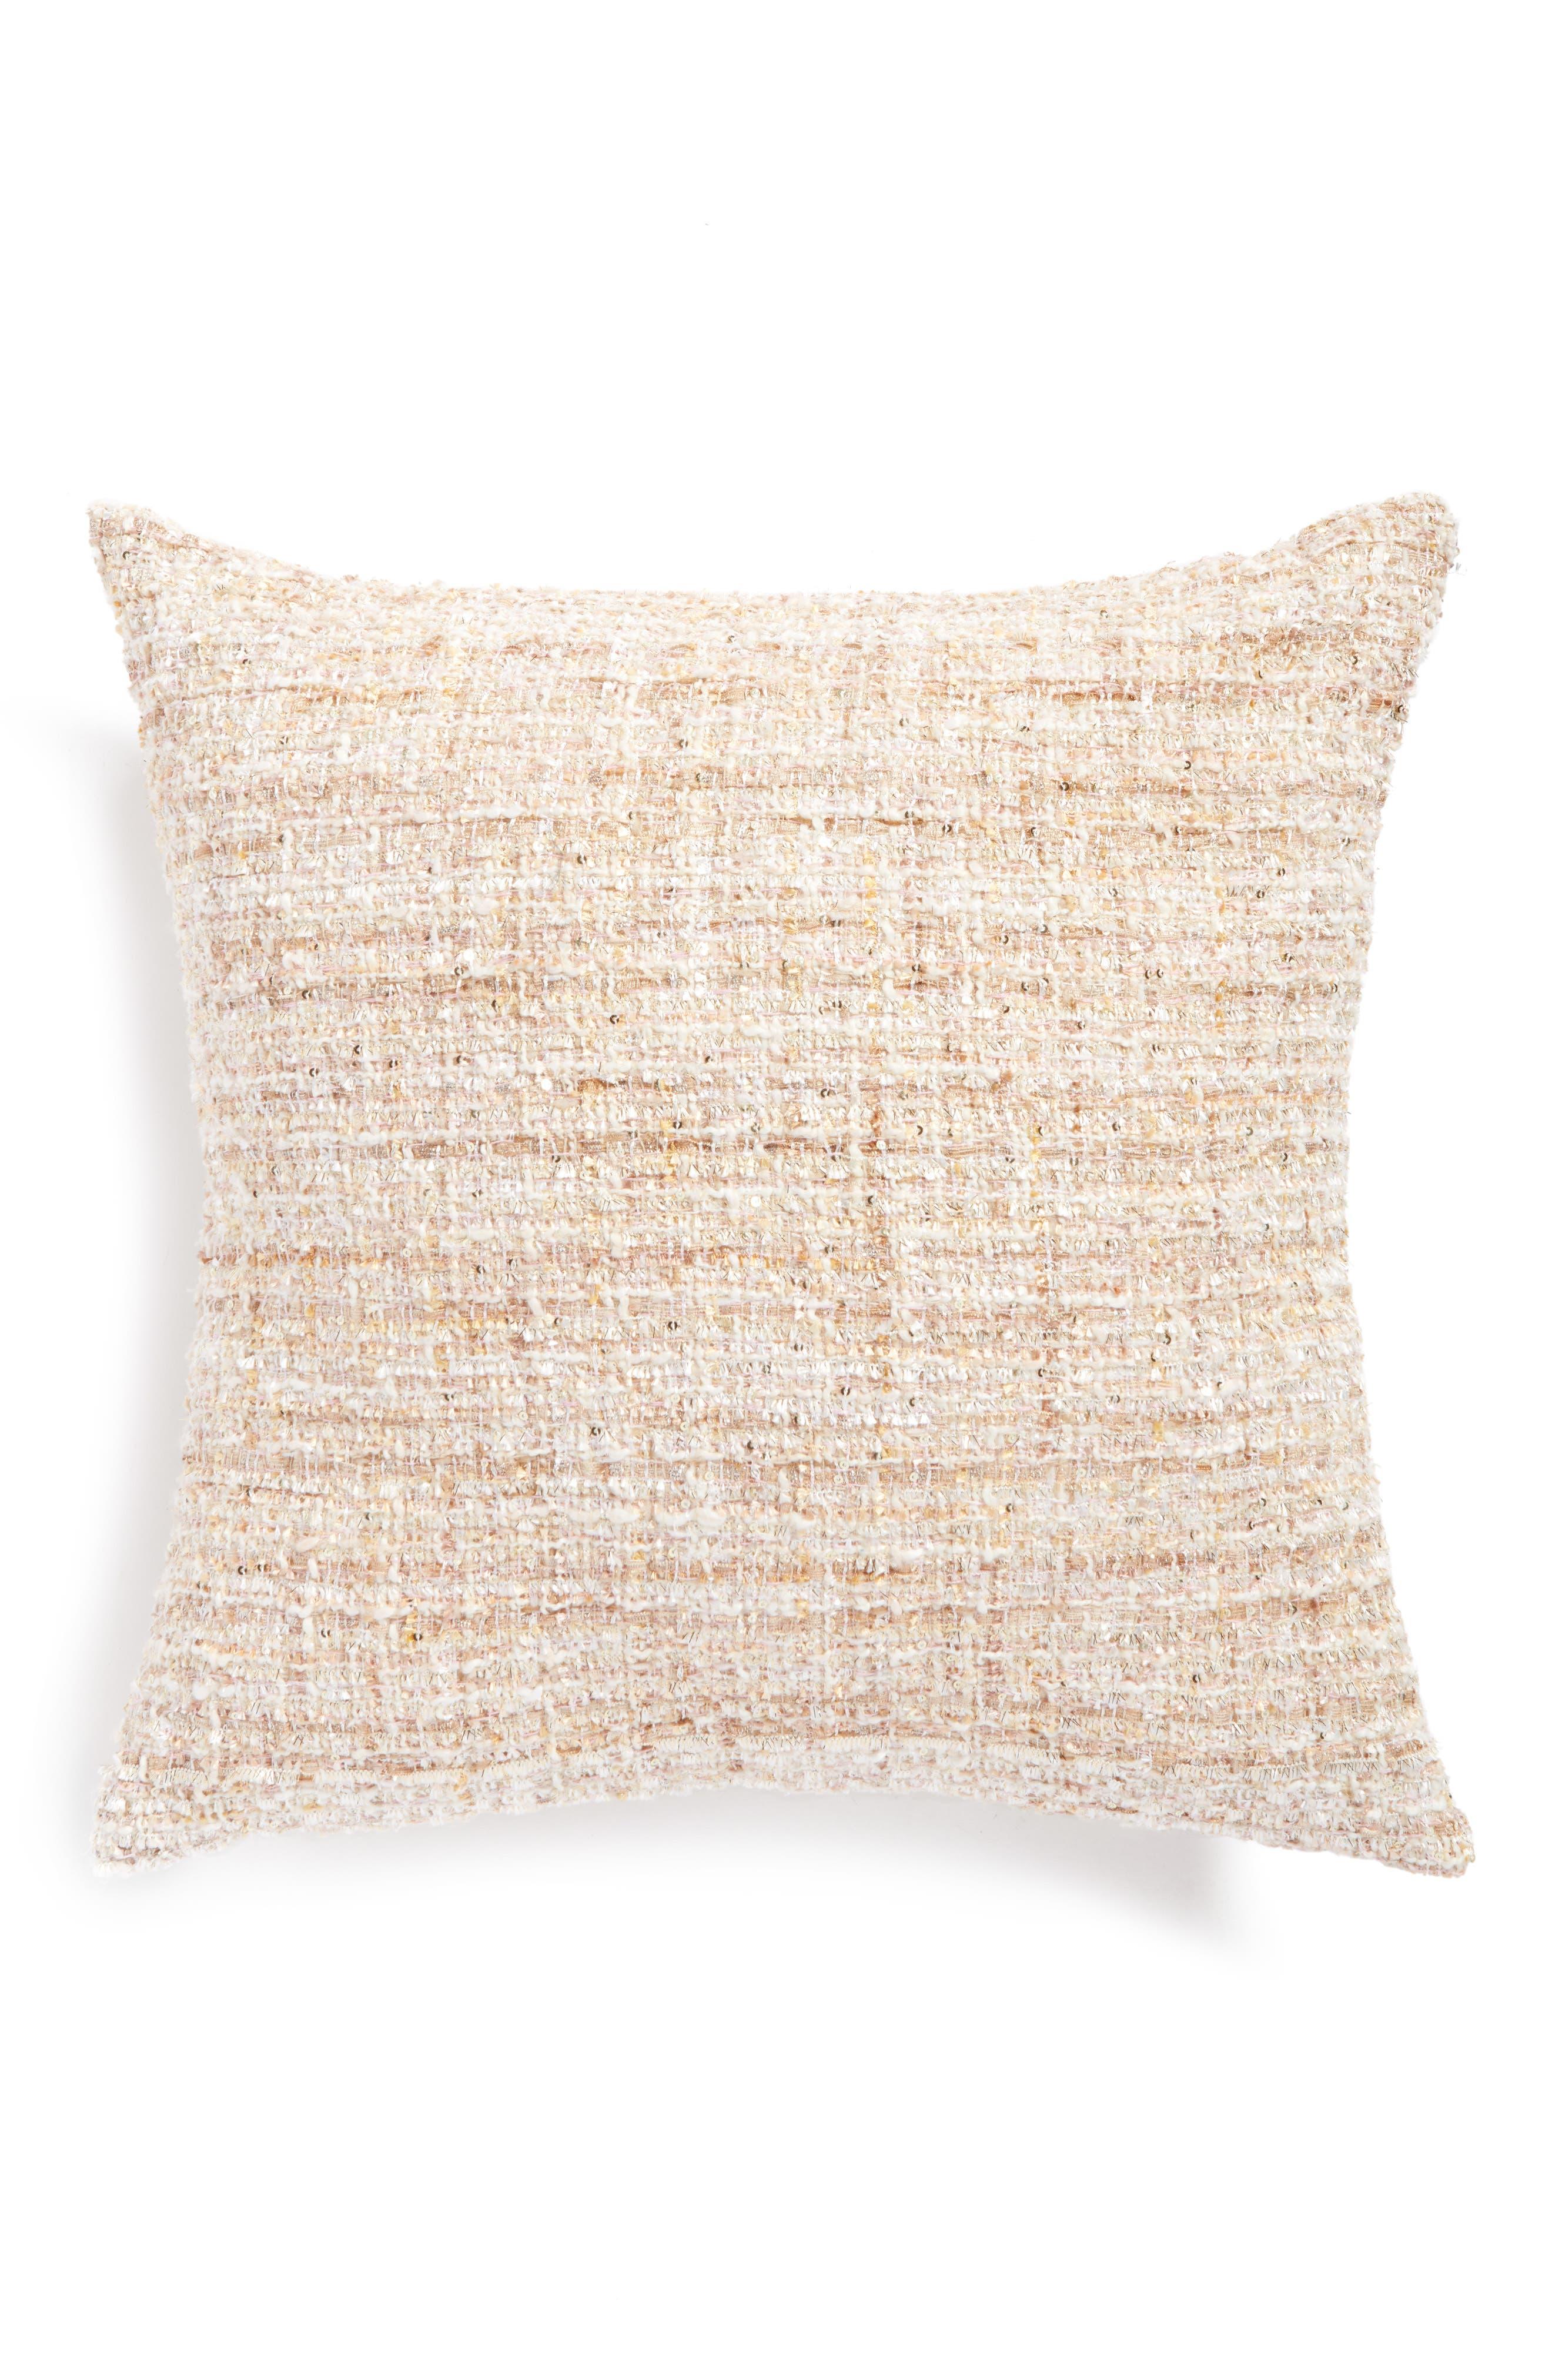 Metallic Accent Pillow,                         Main,                         color, Blush